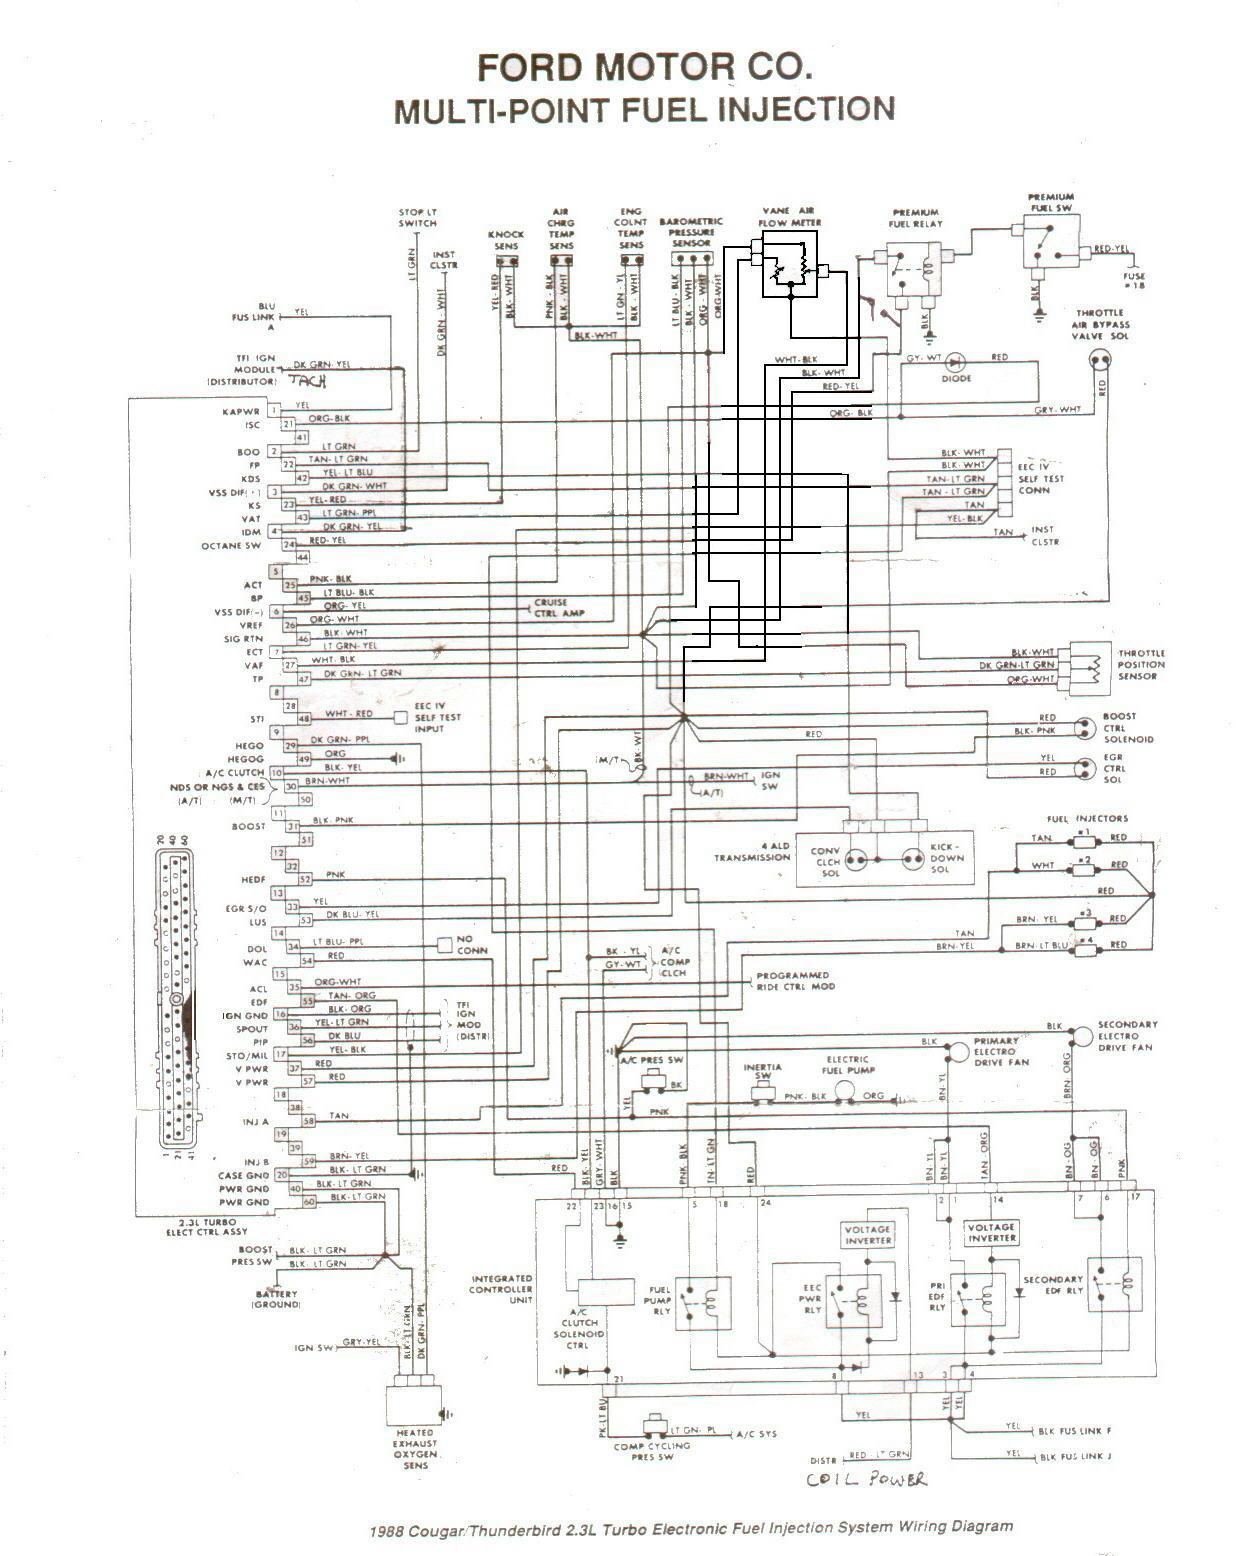 1994 Ranger Wiring Diagram - Wiring Diagrams Schema - toltal.wheeladvisor.it